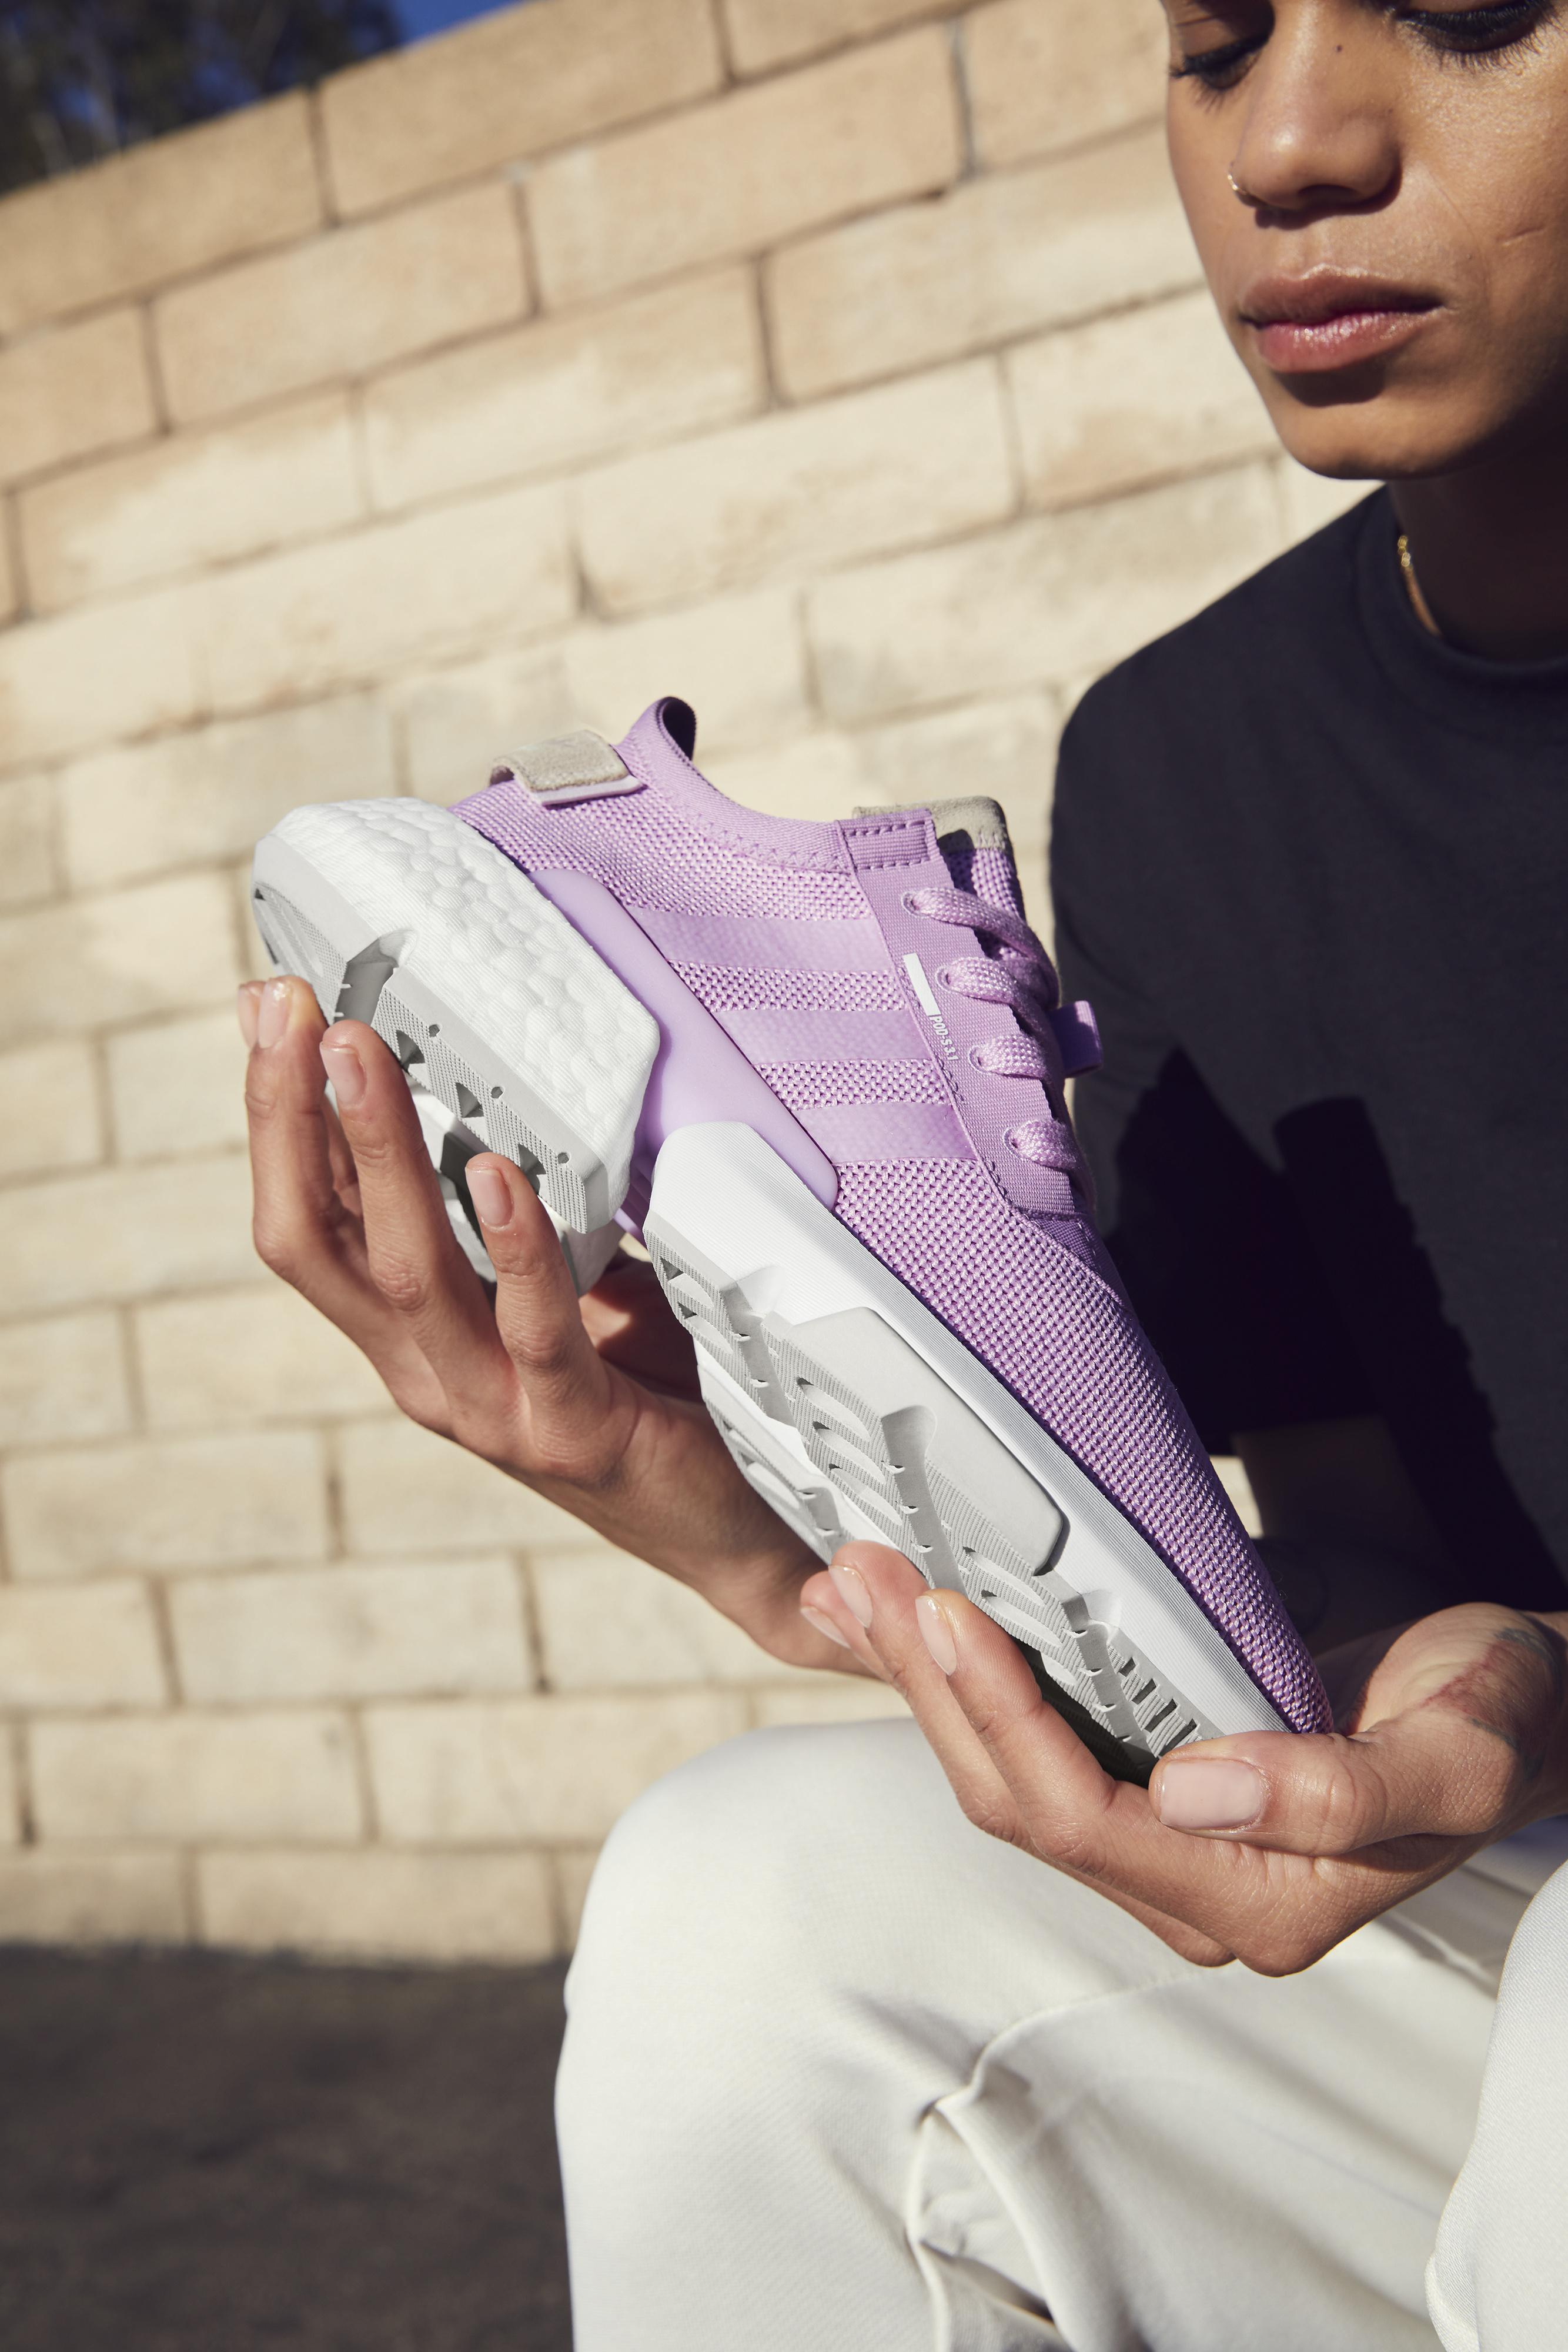 Adidas's P.O.D-S3.1 sneaker.